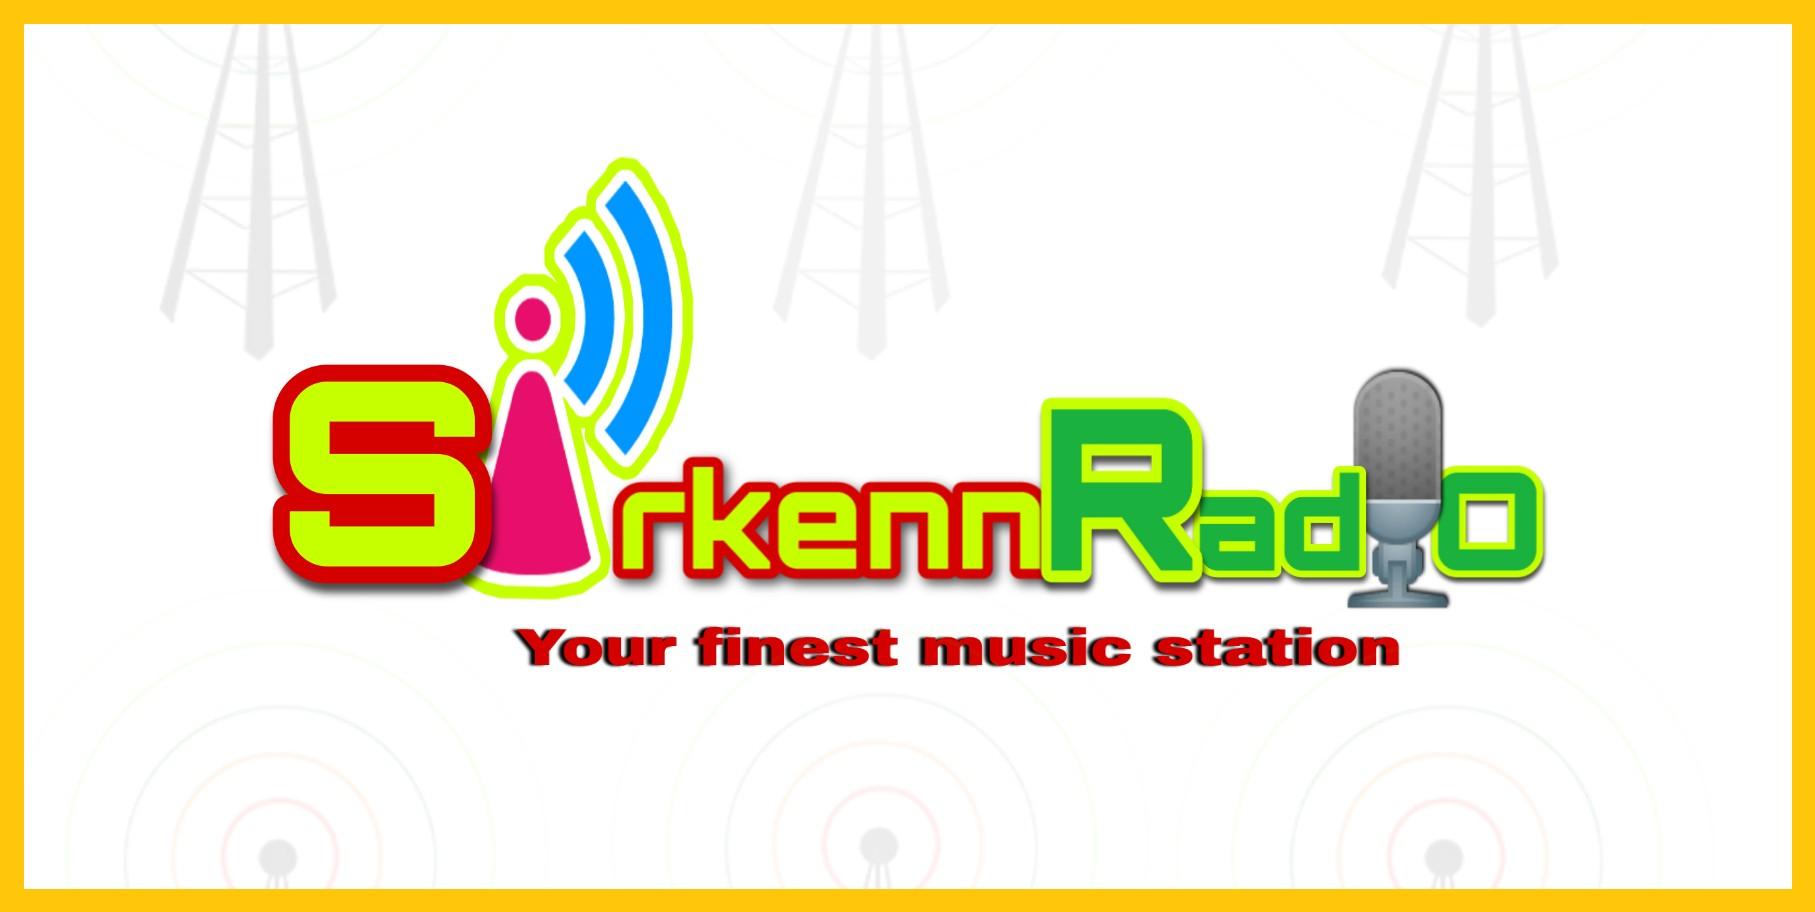 SIRKENN RADIO